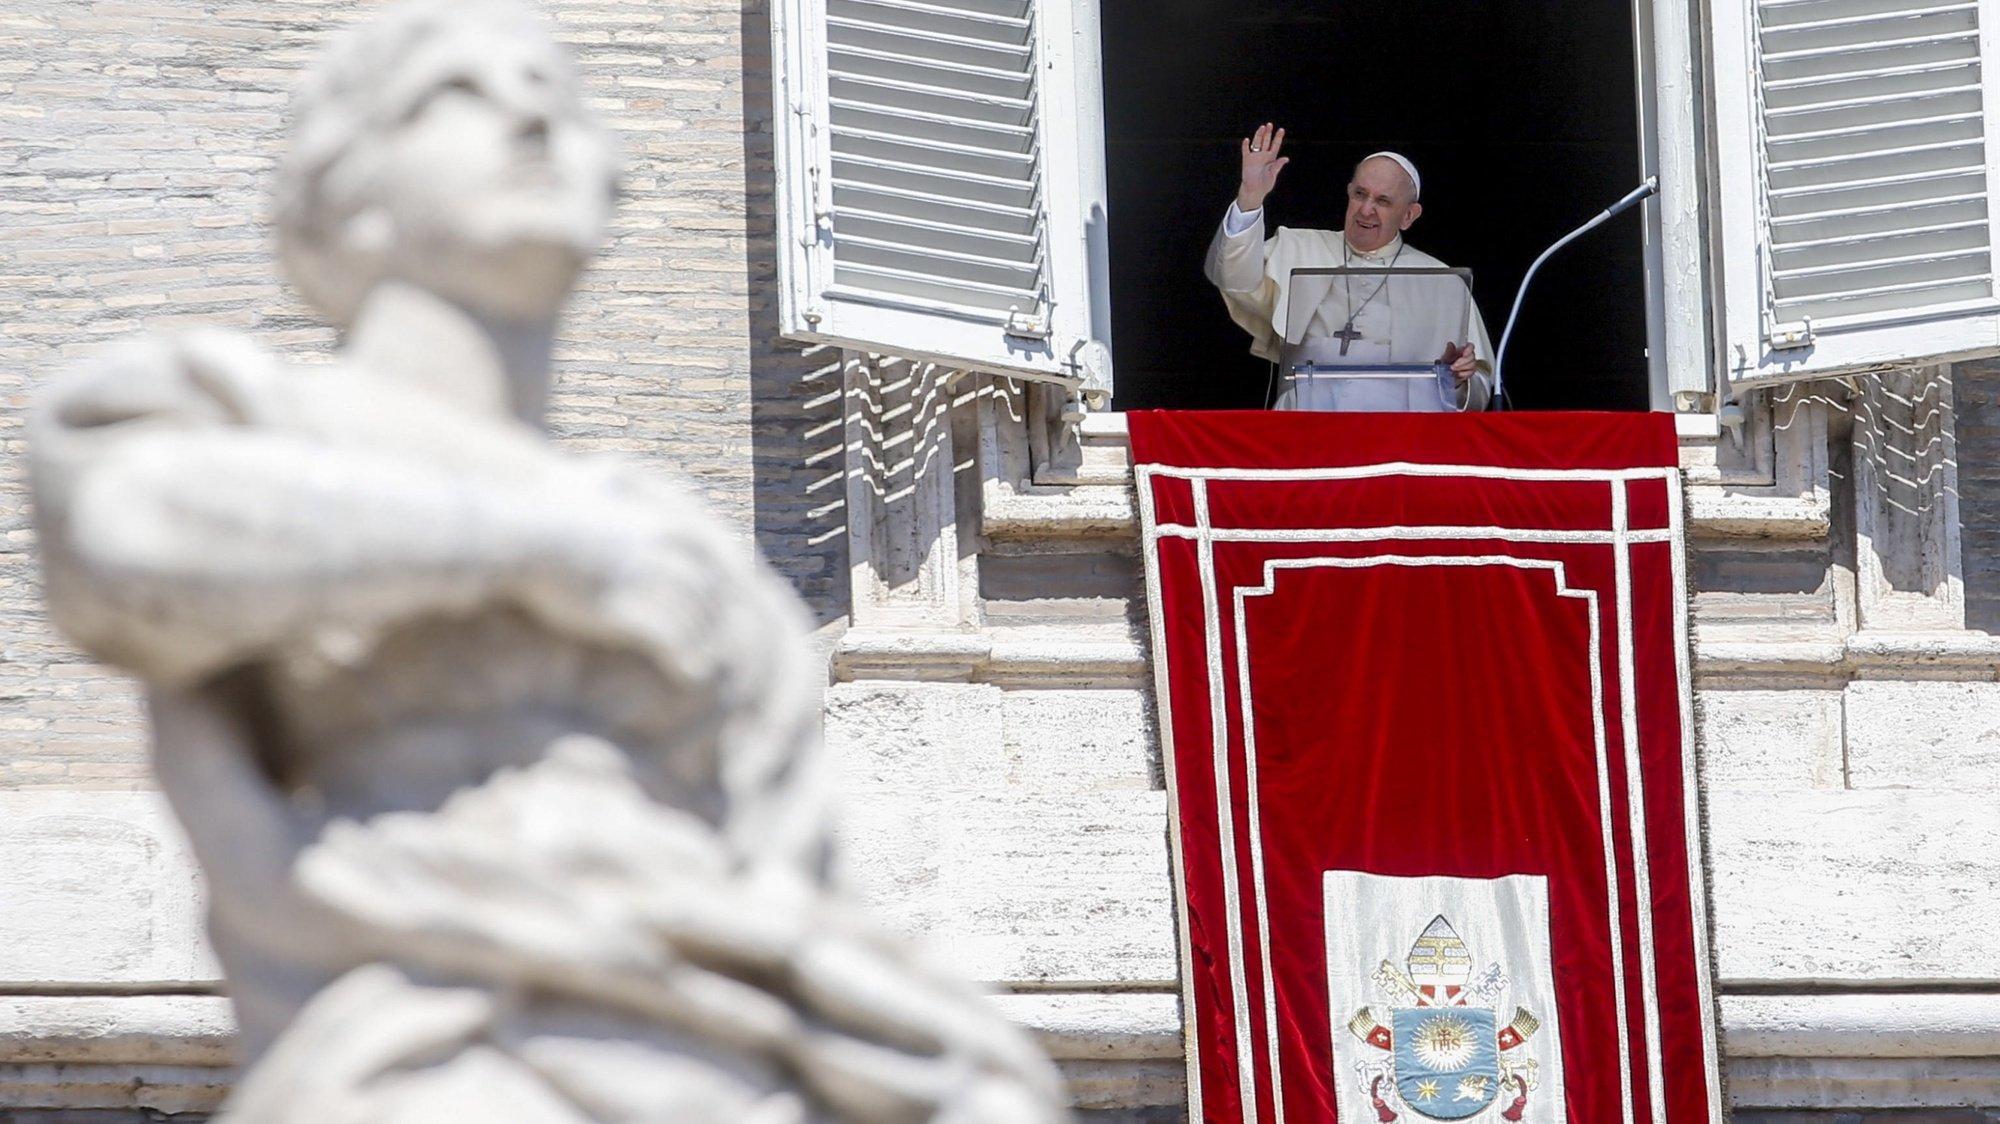 epa09435025 Pope Francis recites the Angelus prayer from the window of his study overlooking Saint Peter's Square, Vatican City, 29 August 2021.  EPA/FABIO FRUSTACI